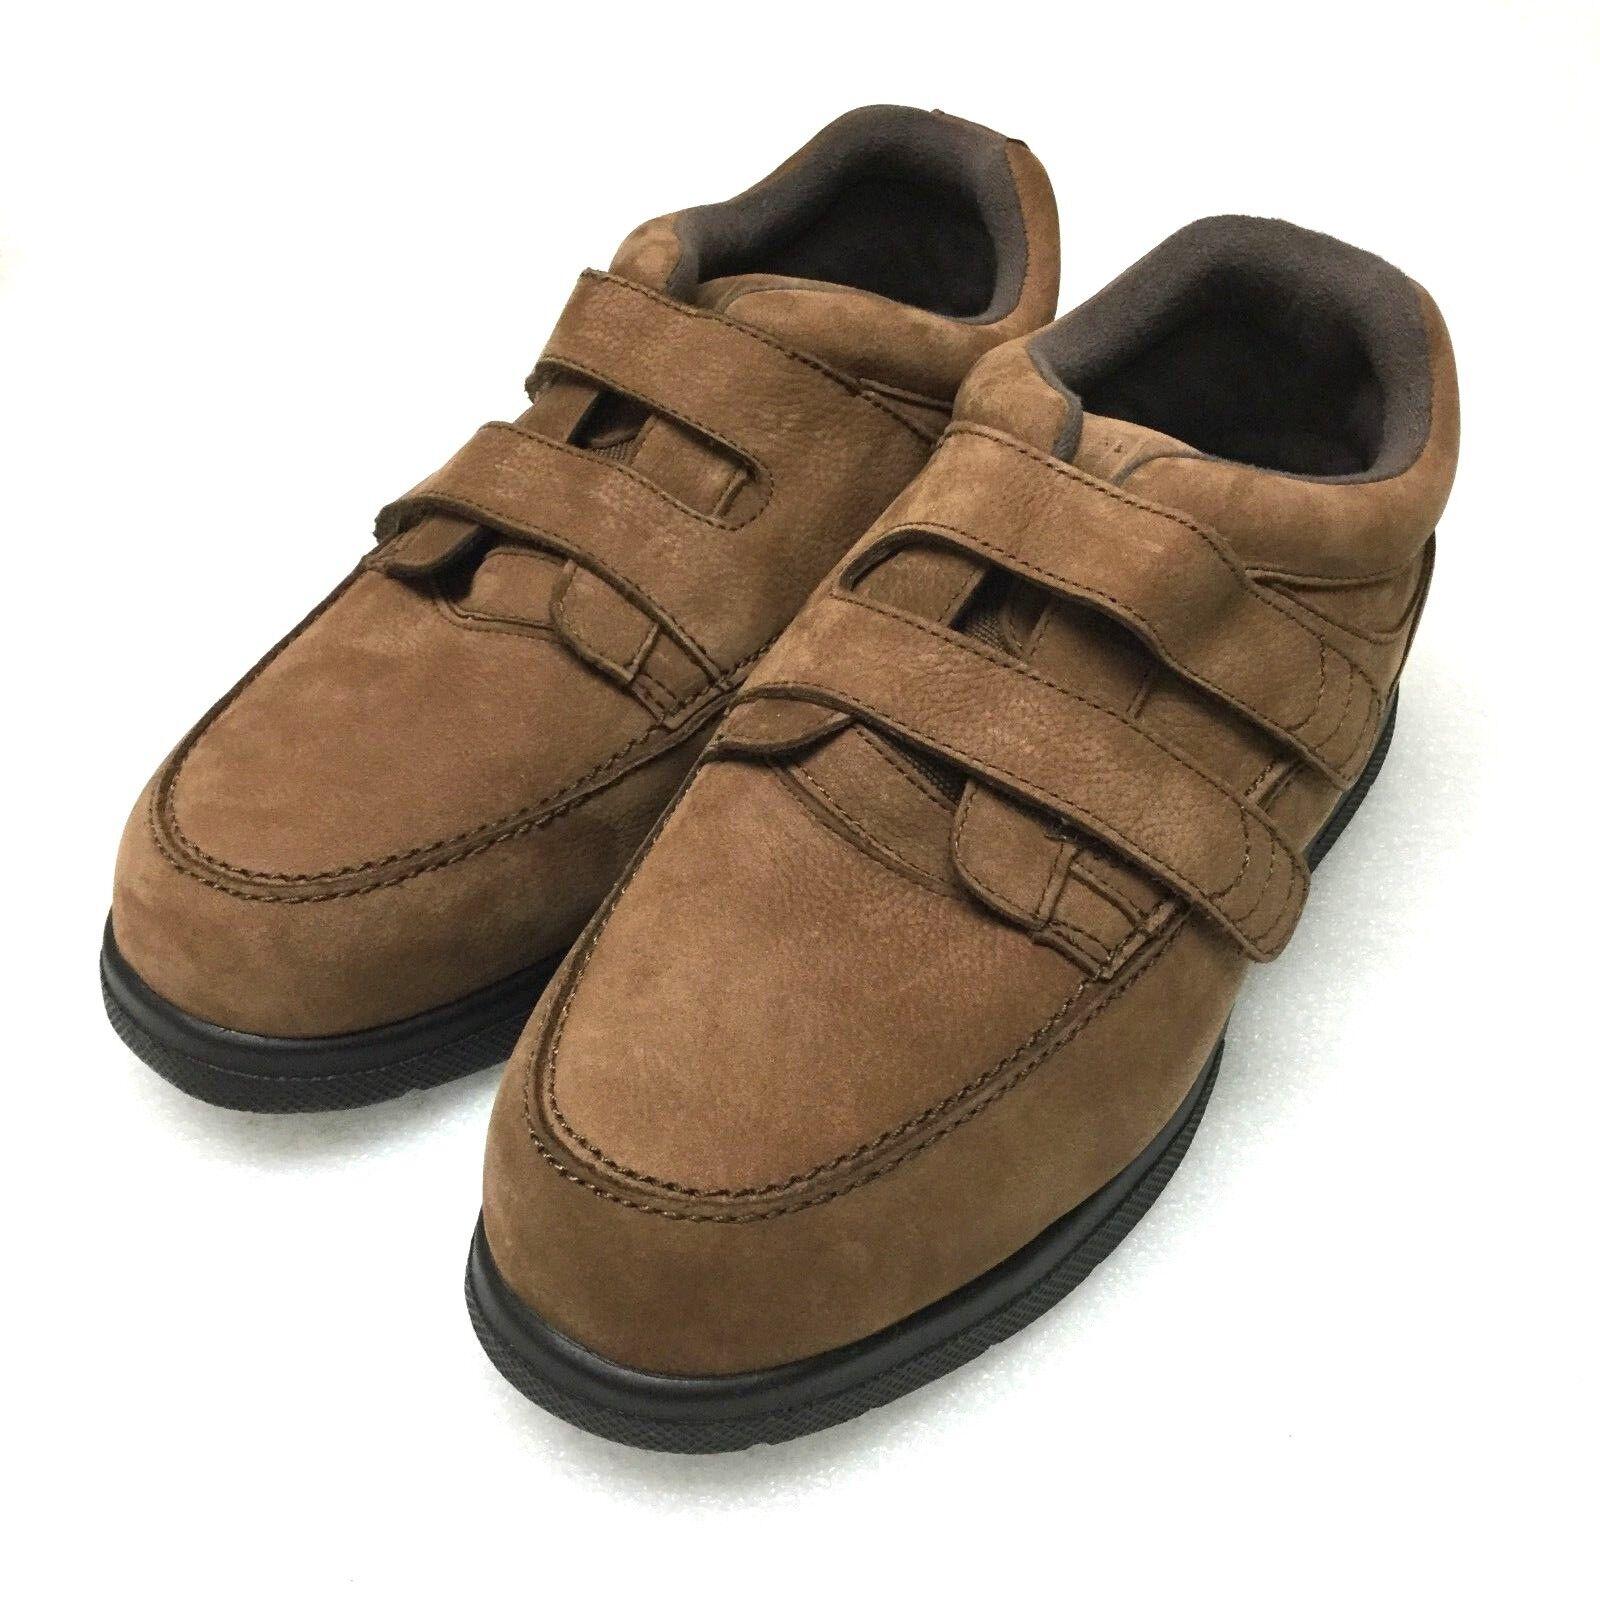 Drew for Men Traveler V 44908-59 Walking Comfort Casual shoes with Straps